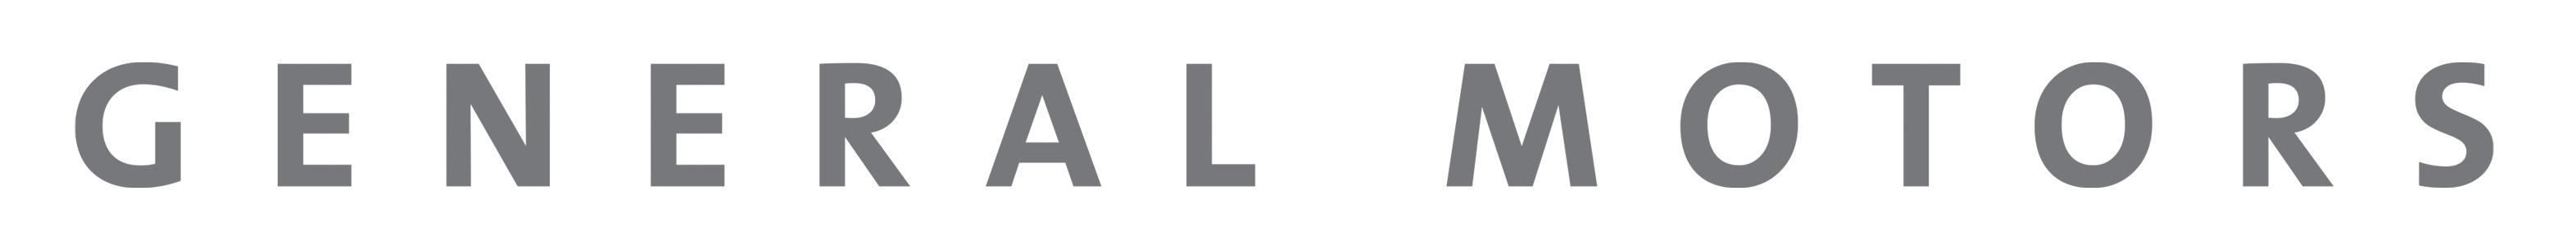 The GM Signature logo (Feb 2015)